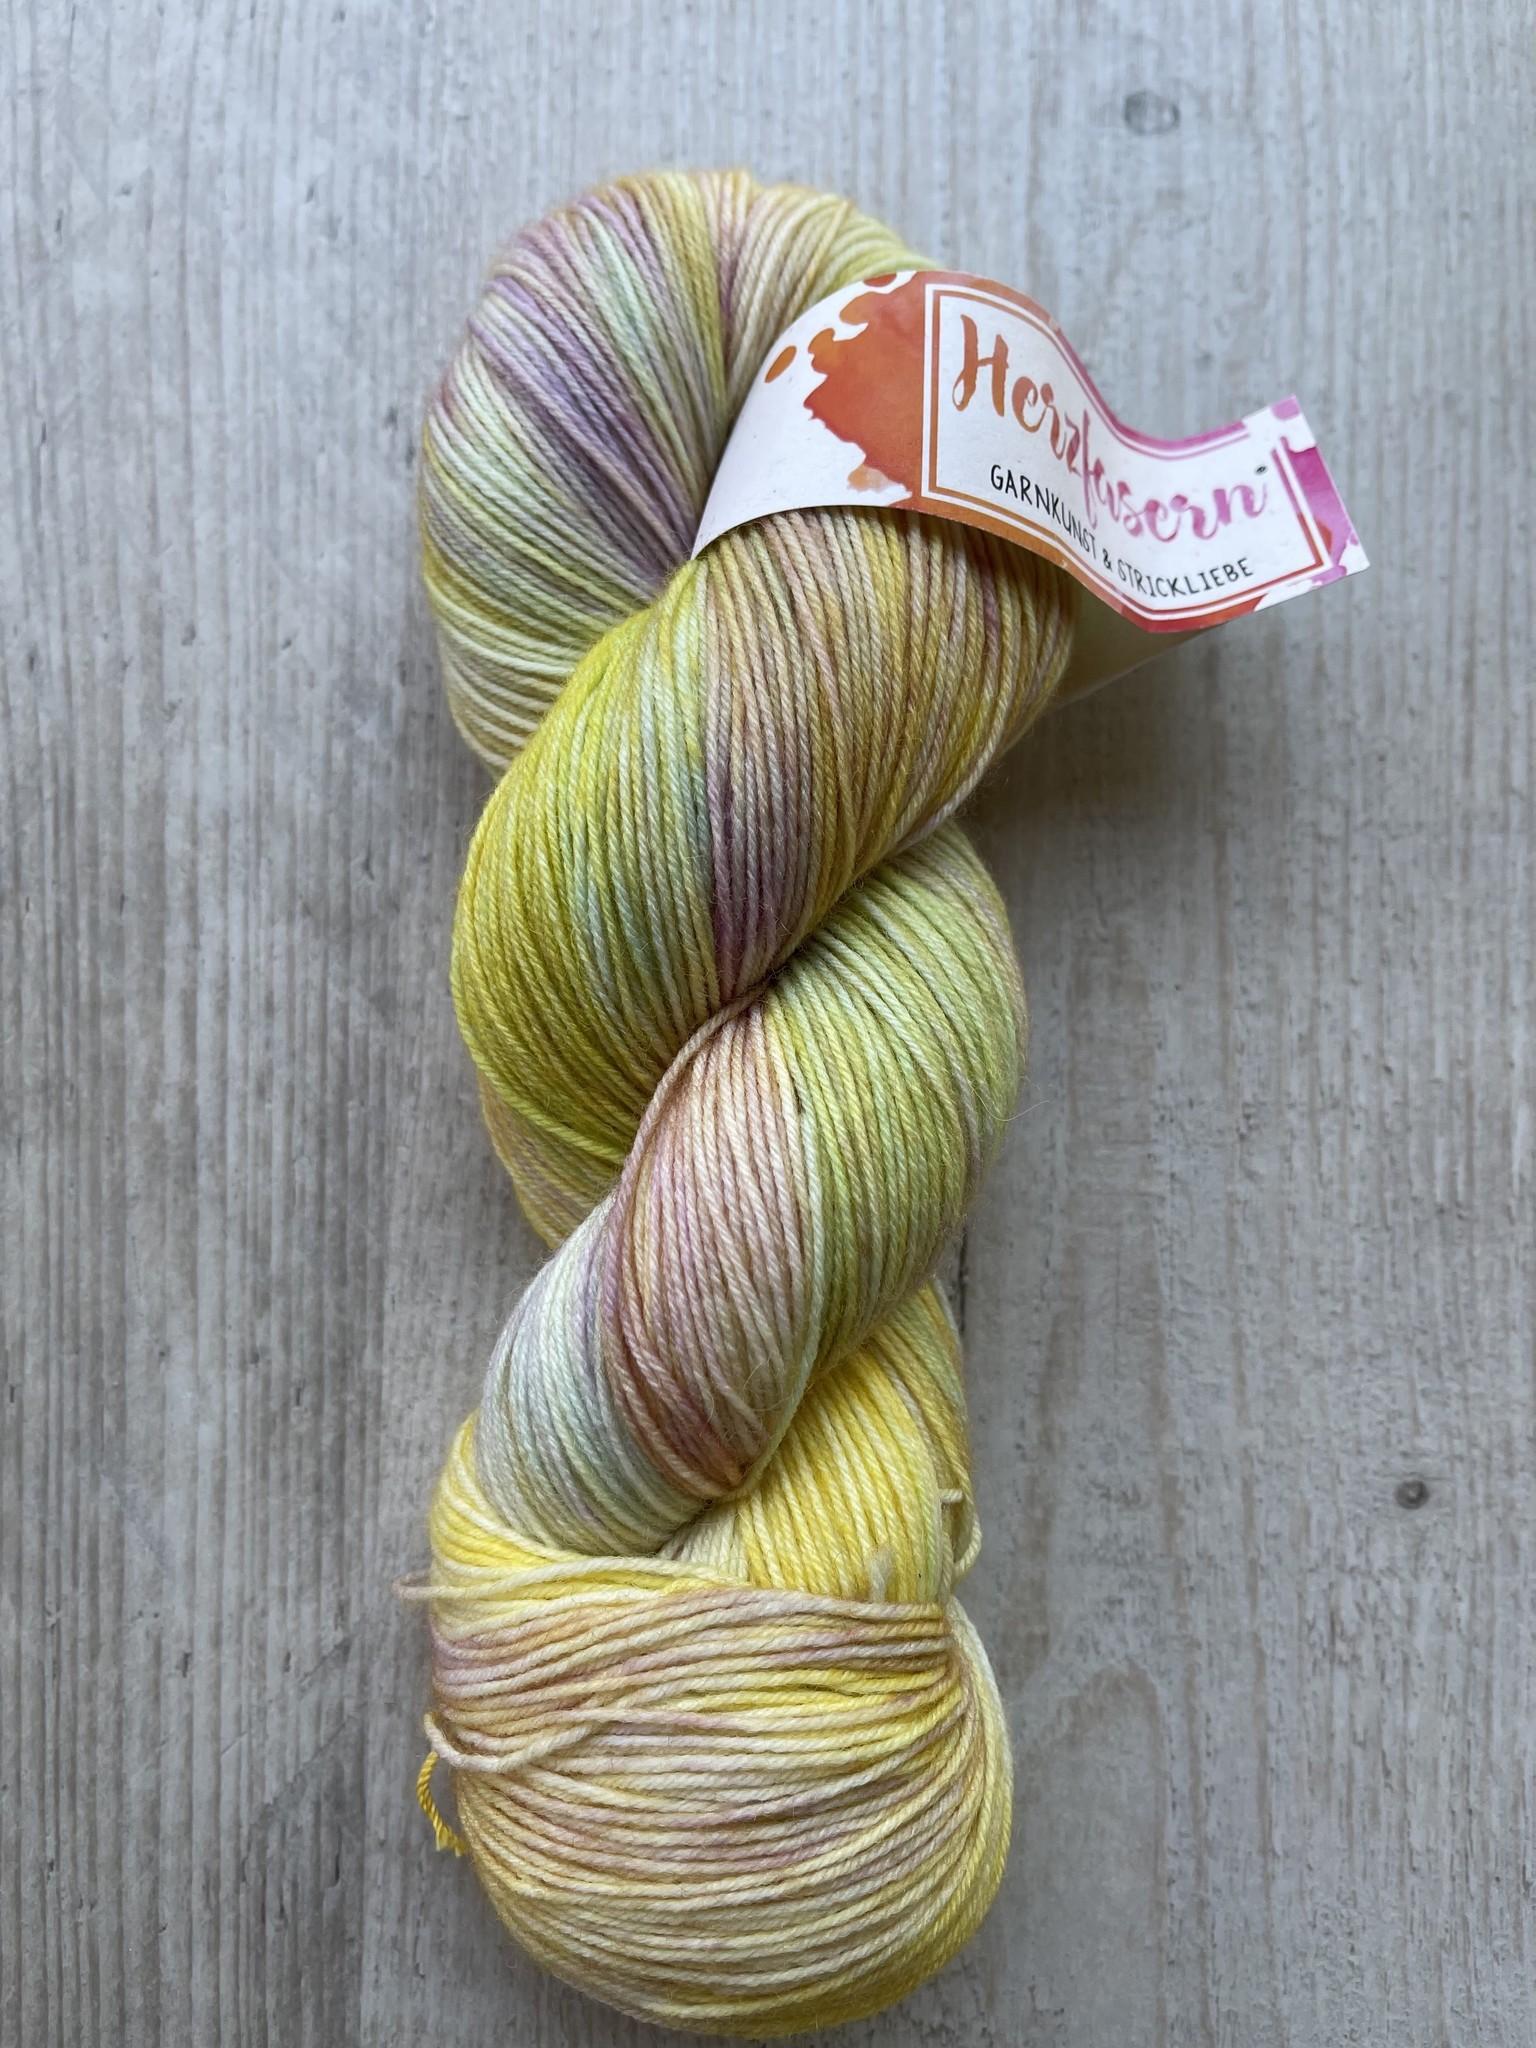 Herzfasern Sockenwolle - Aquarell gelb